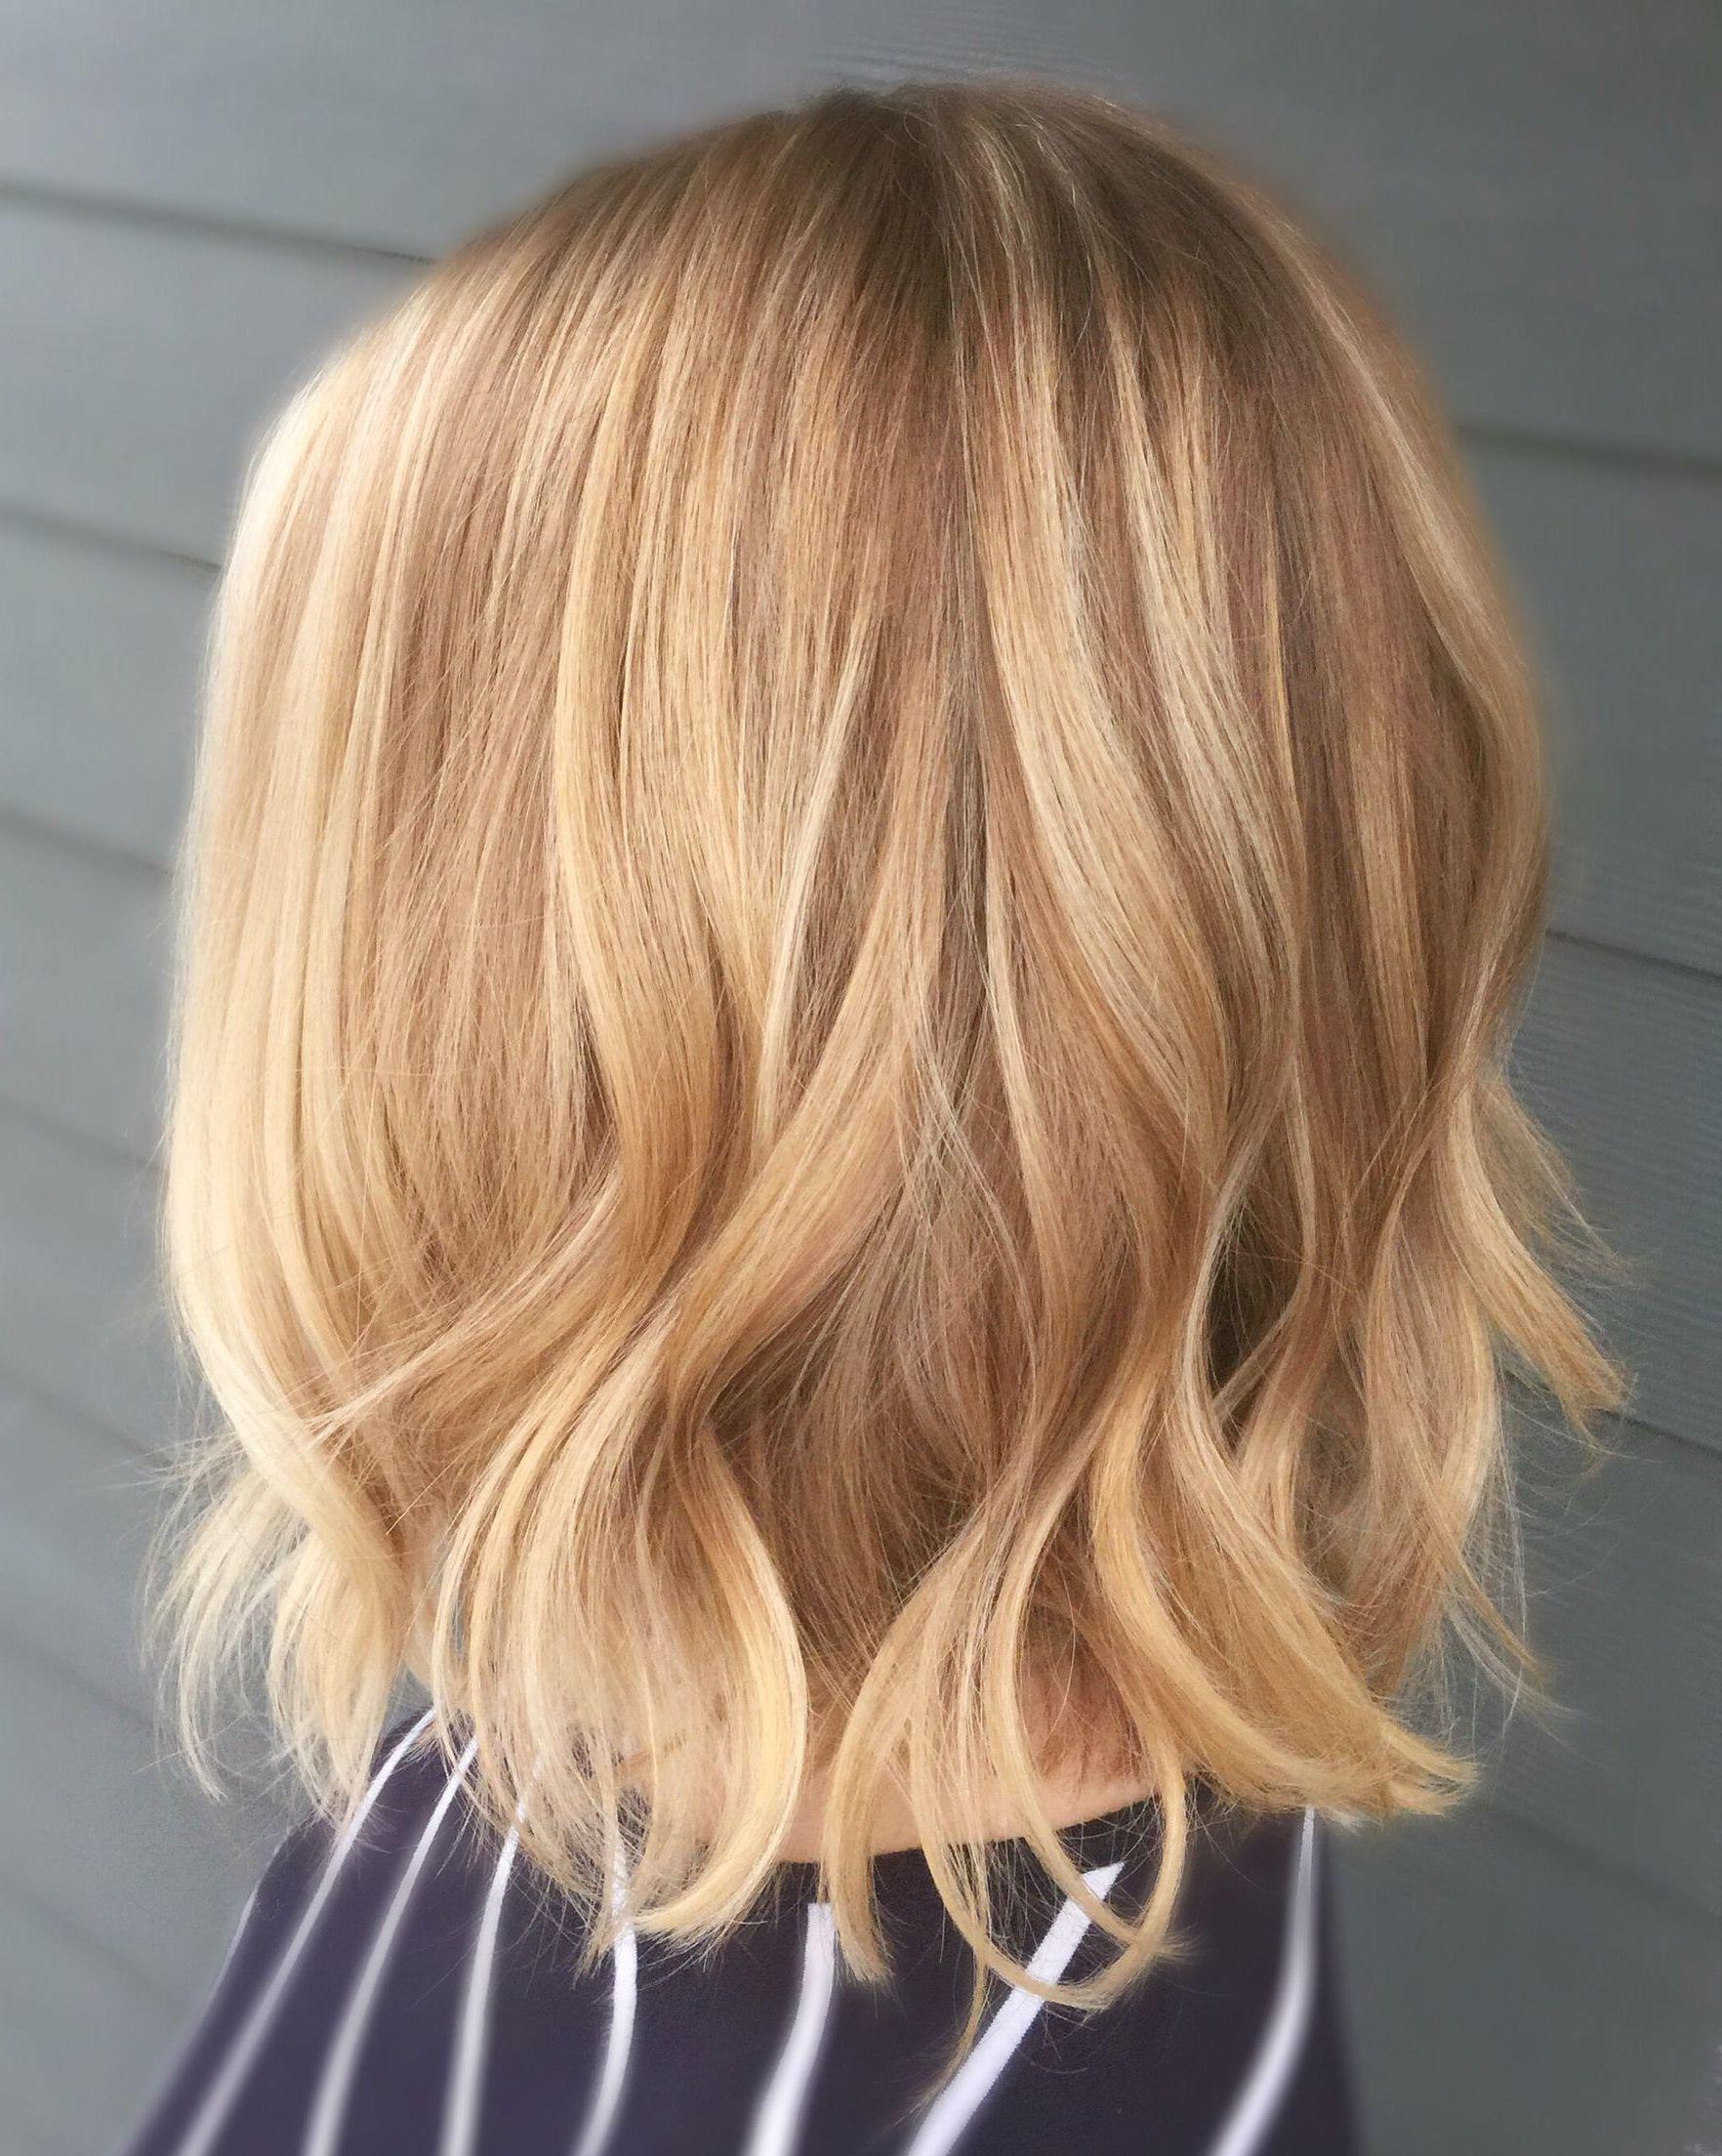 28 Latest Balayage Hair Color Ideas For Short Hair Honey Blonde